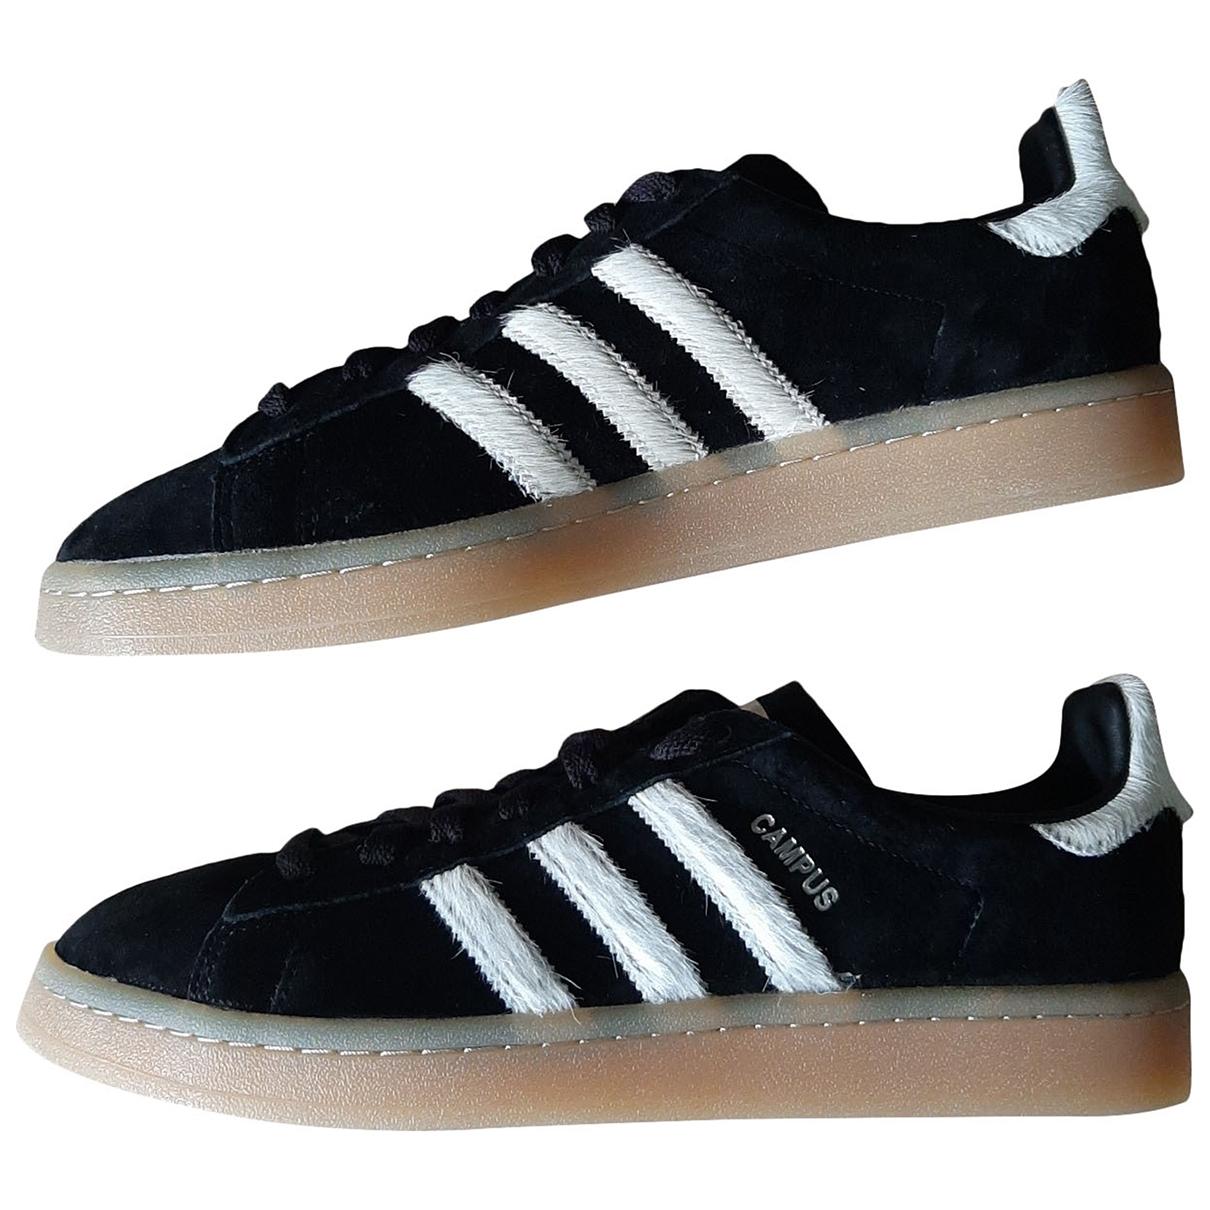 Adidas \N Black Suede Trainers for Men 42 EU